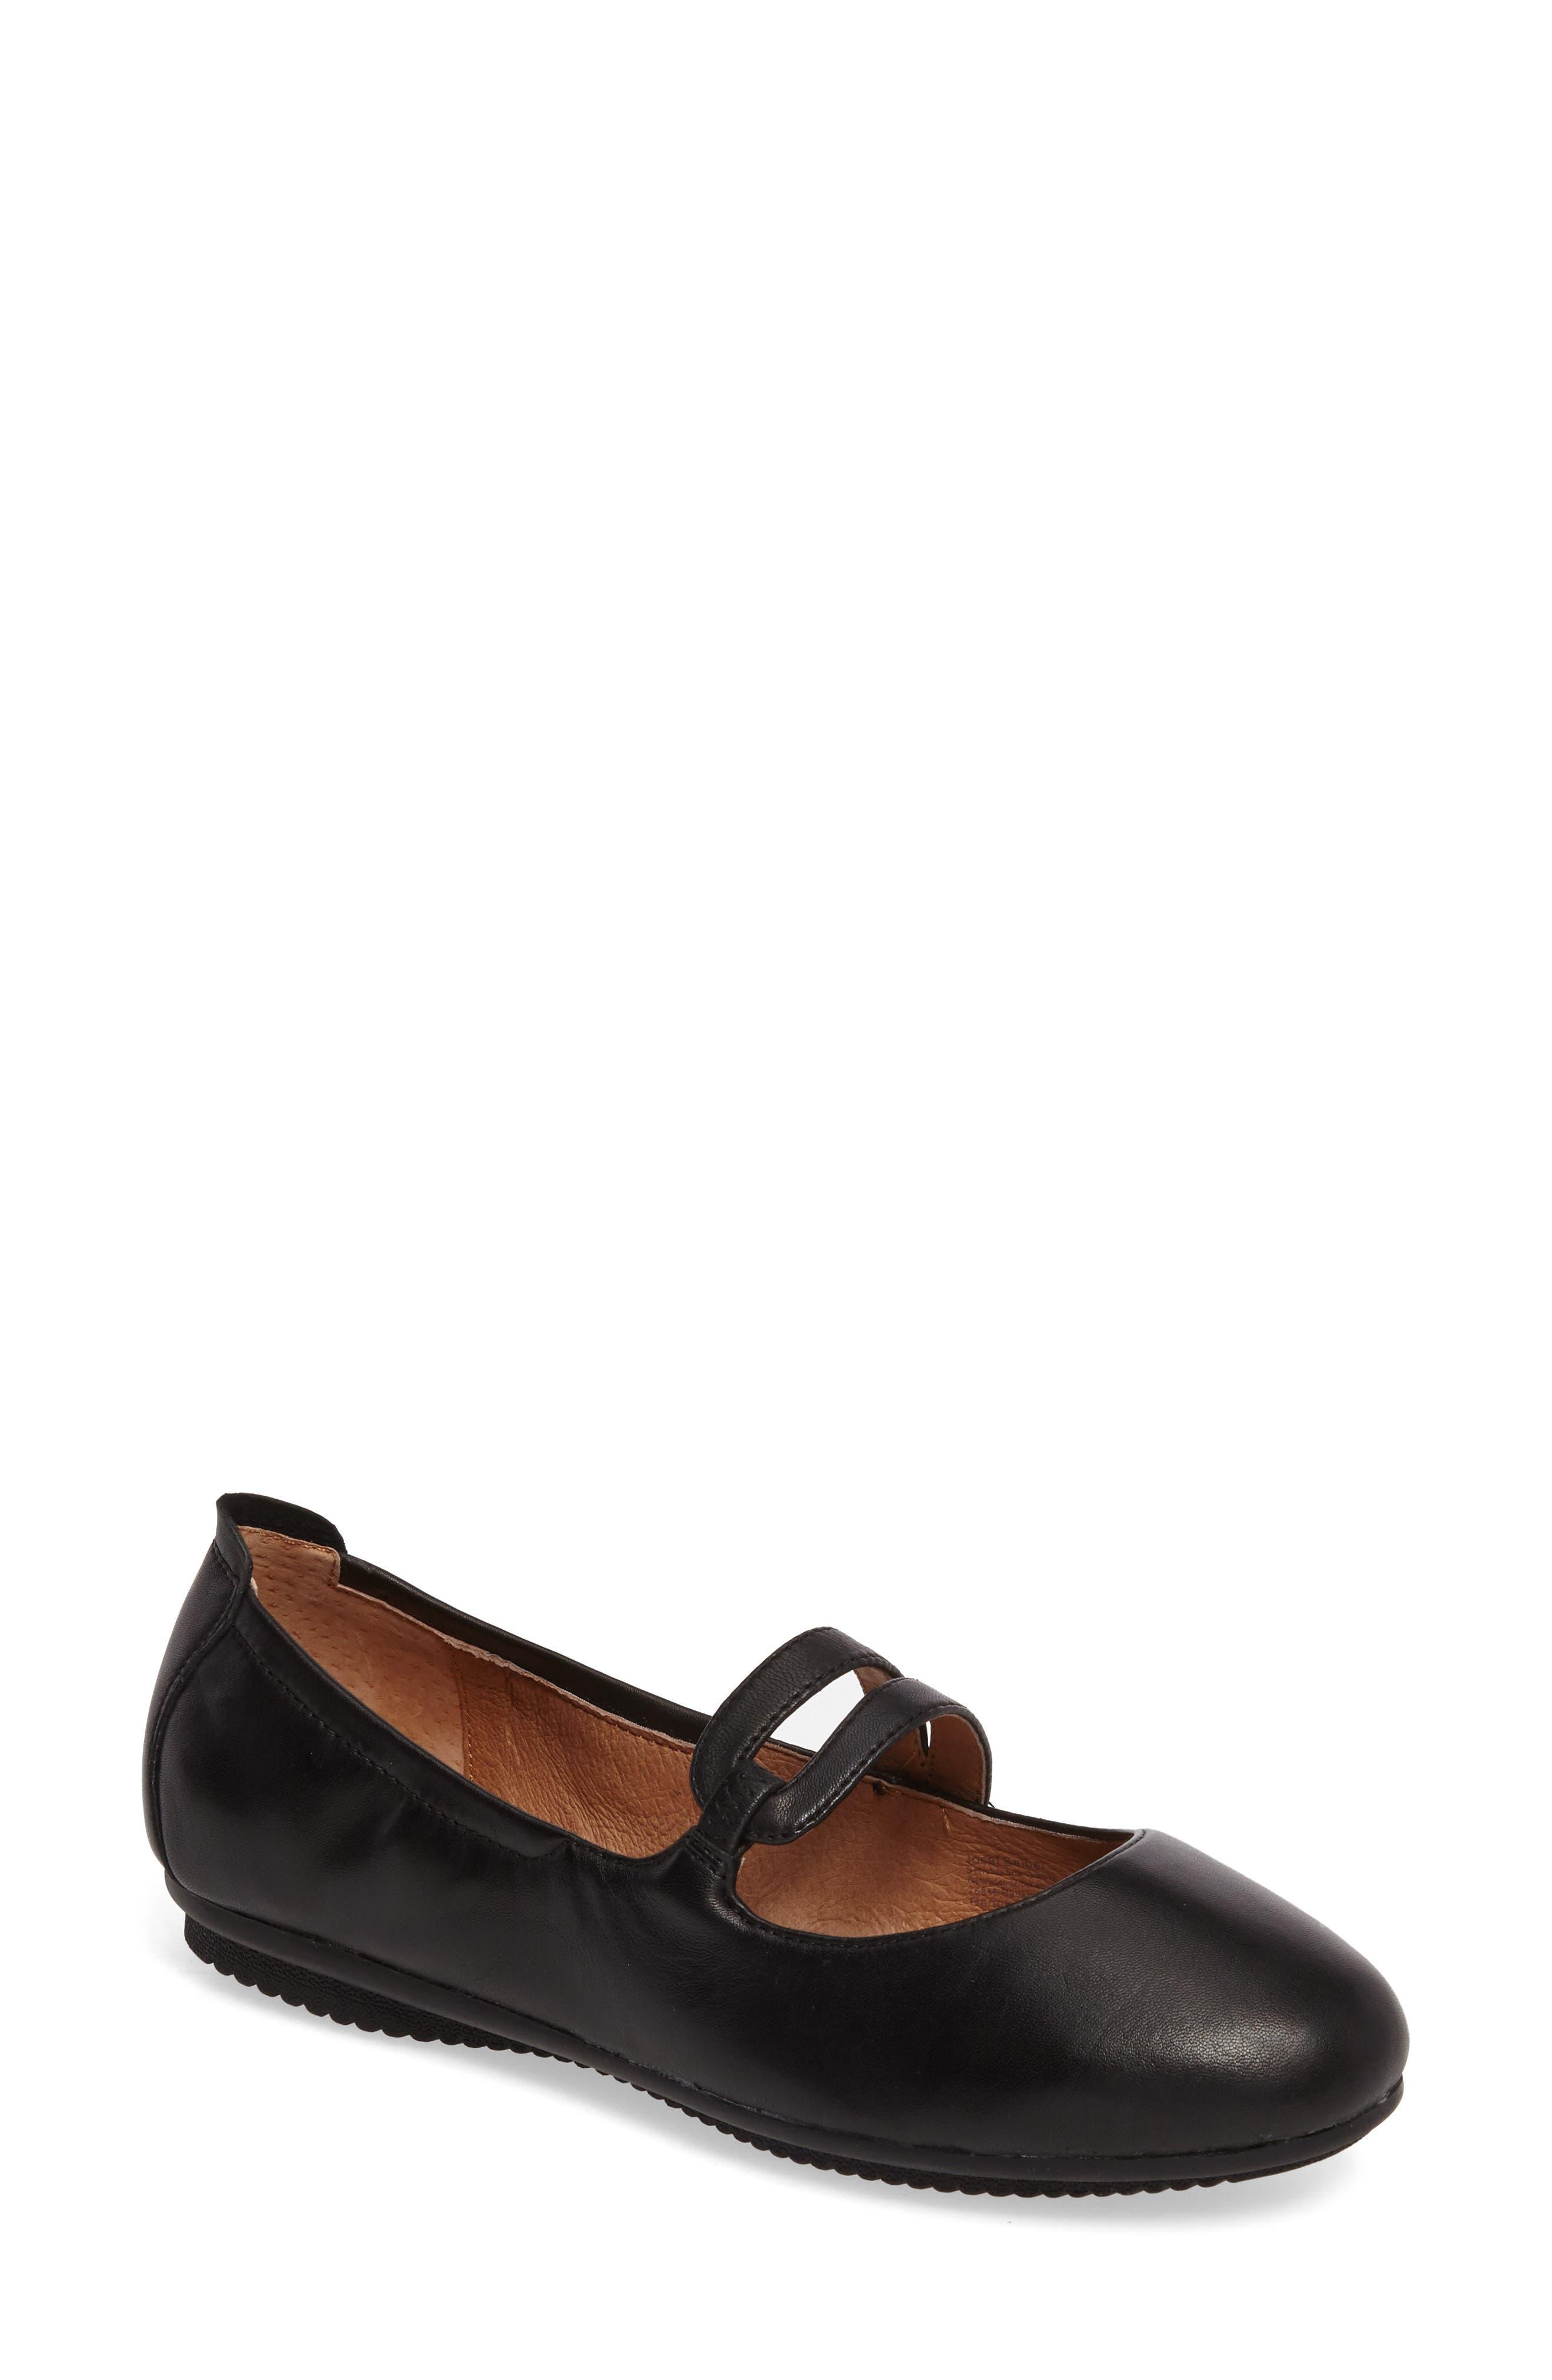 Pippa 63 Flat,                             Main thumbnail 1, color,                             Black Leather